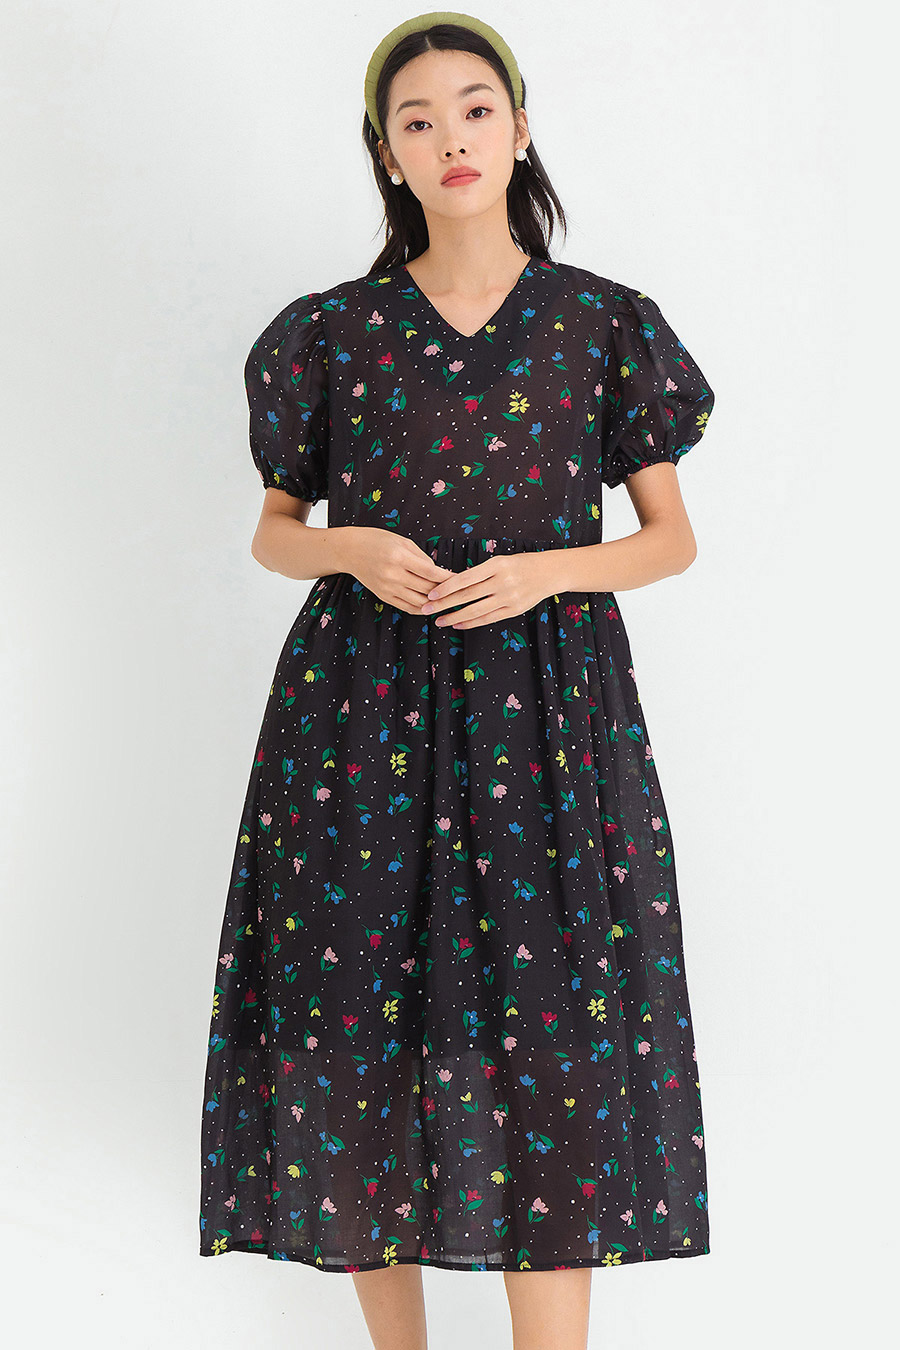 ALFIE DRESS - NOIR FLEUR